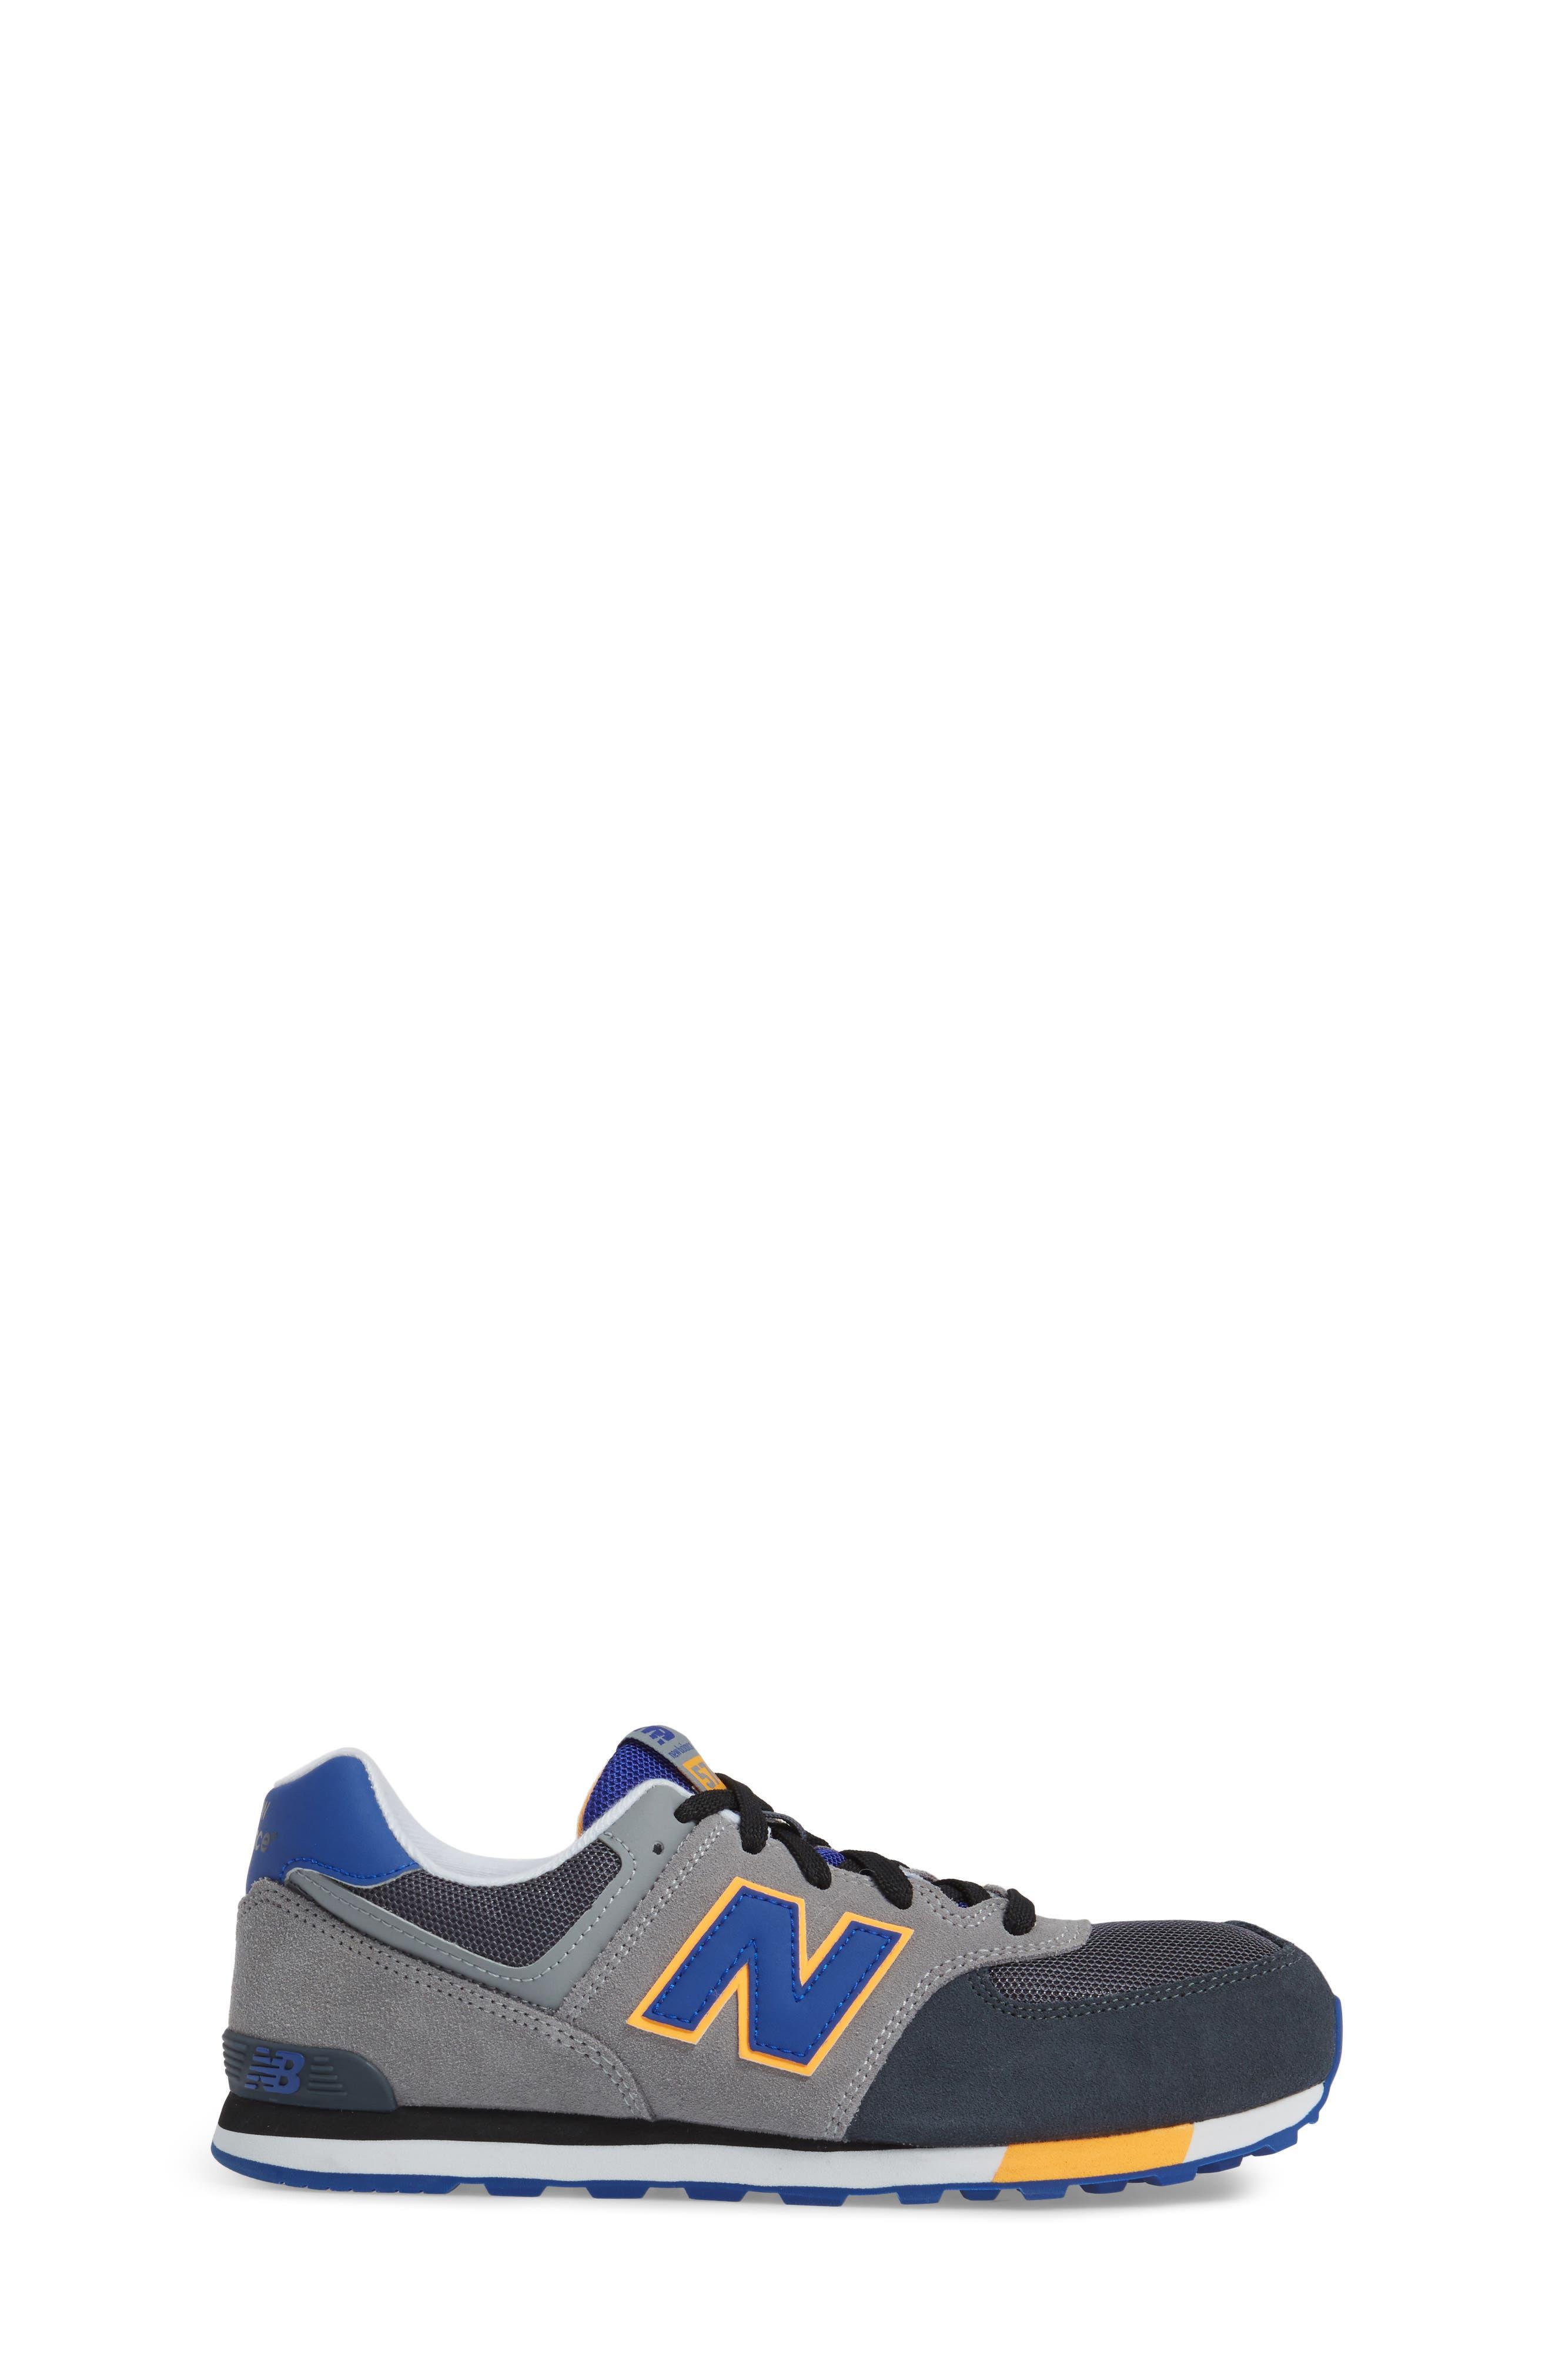 574 Cut & Paste Sneaker,                             Alternate thumbnail 3, color,                             Grey/ Blue